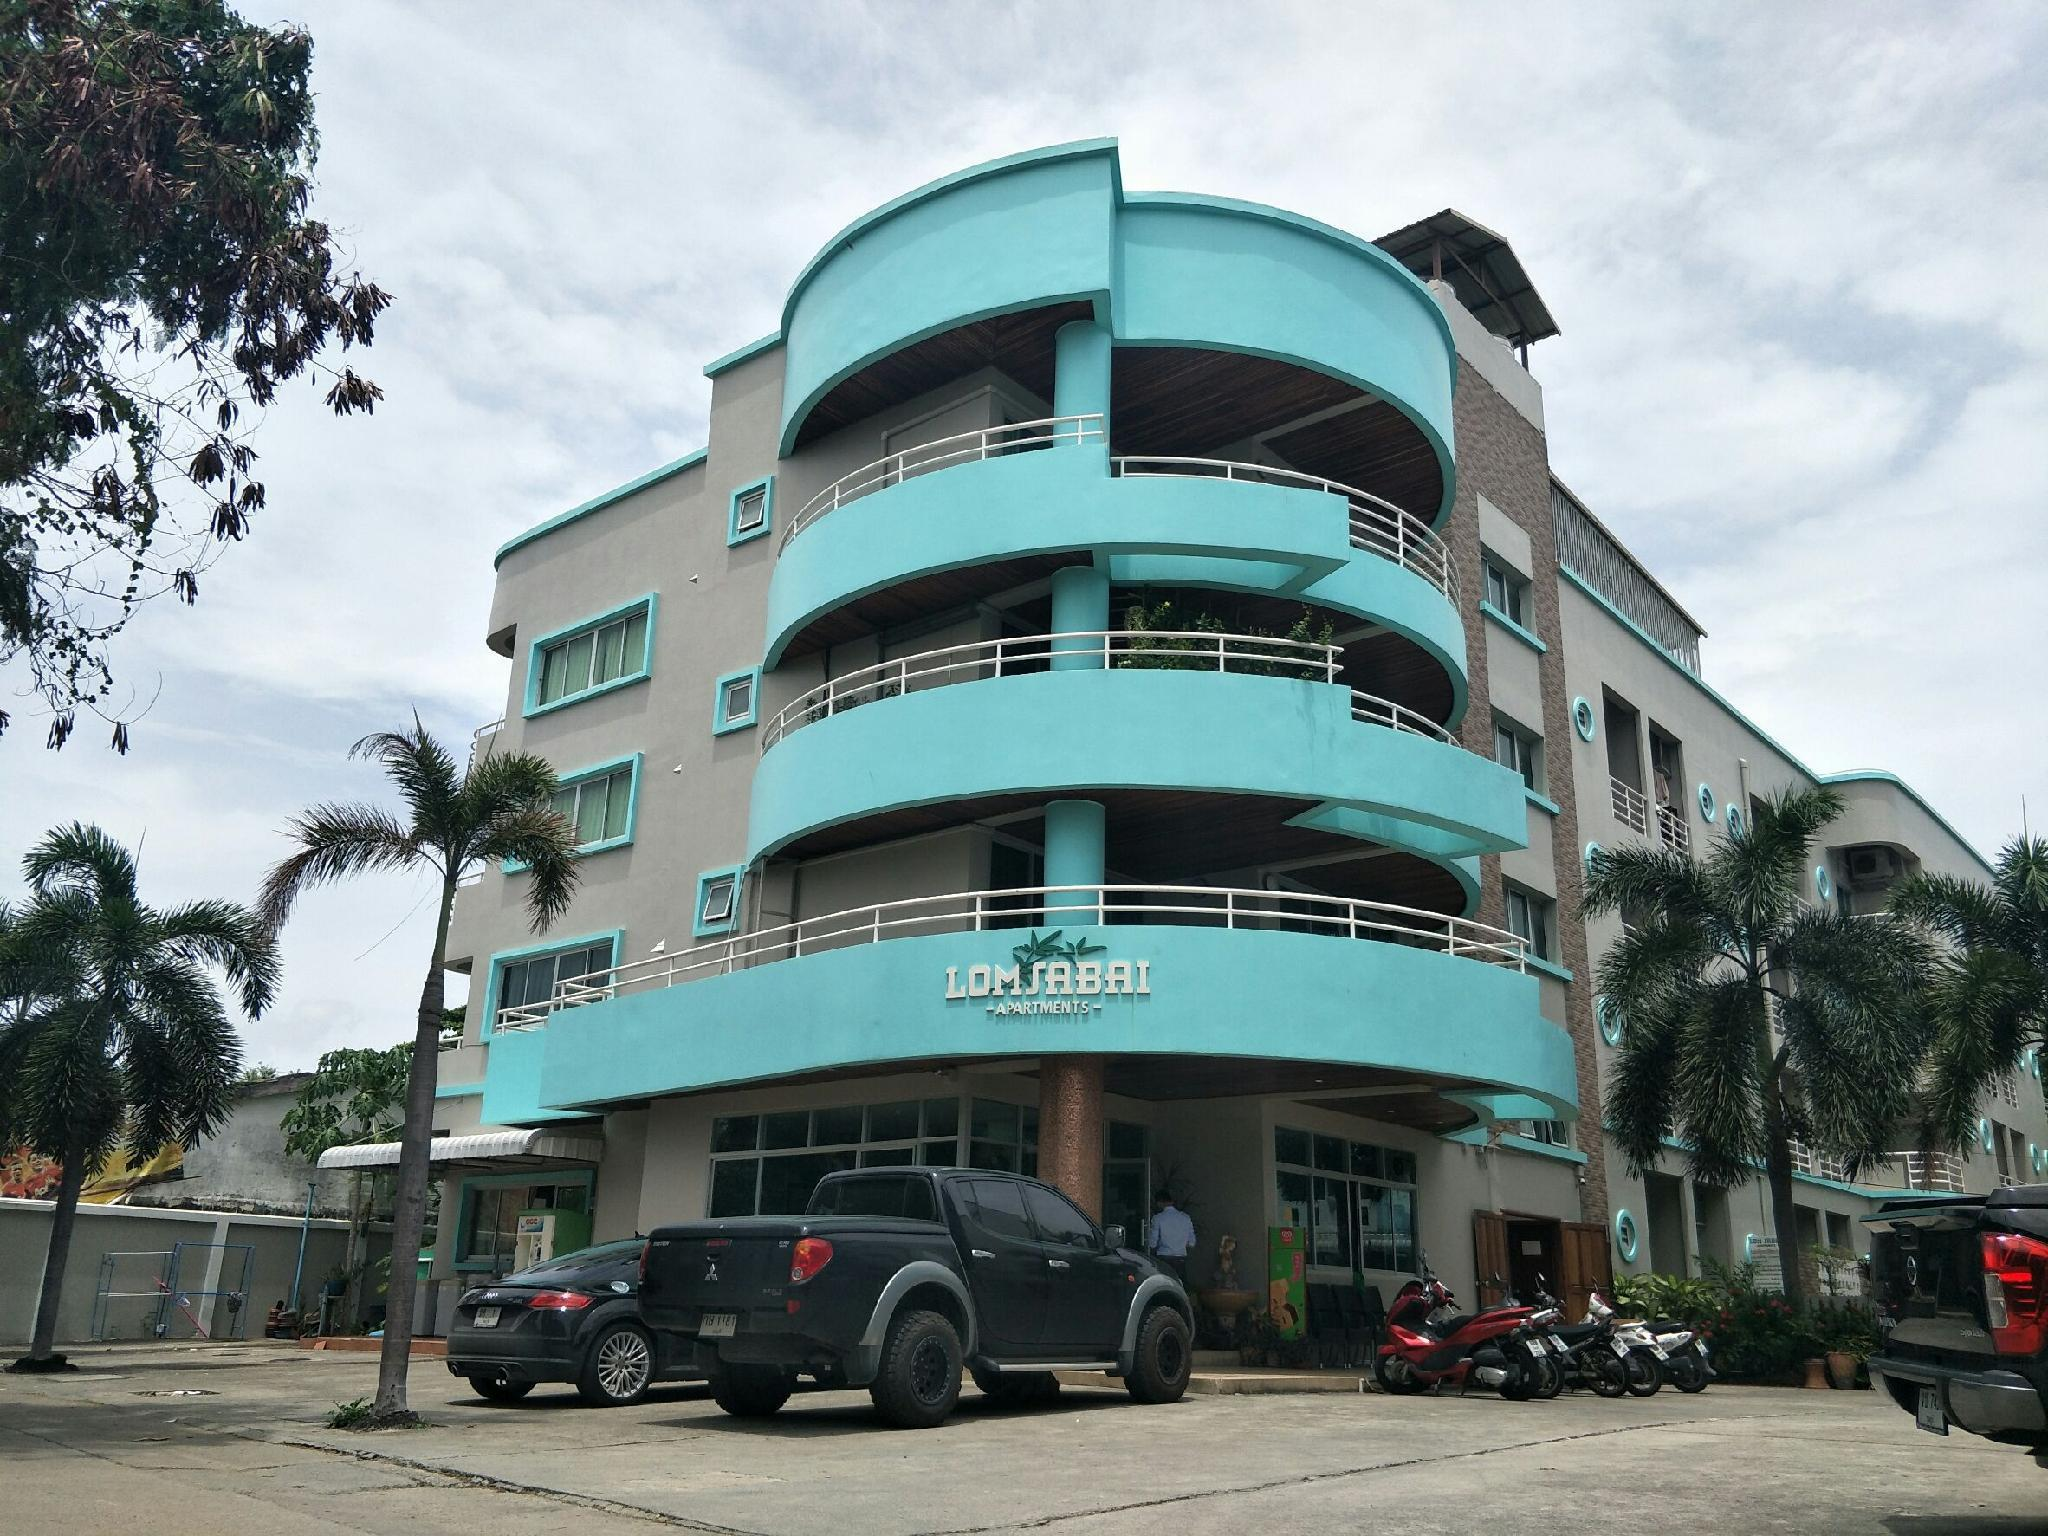 Lomsabai Apartments Chon Buri ลมสบาย อพาร์ตเมนต์ ชลบุรี